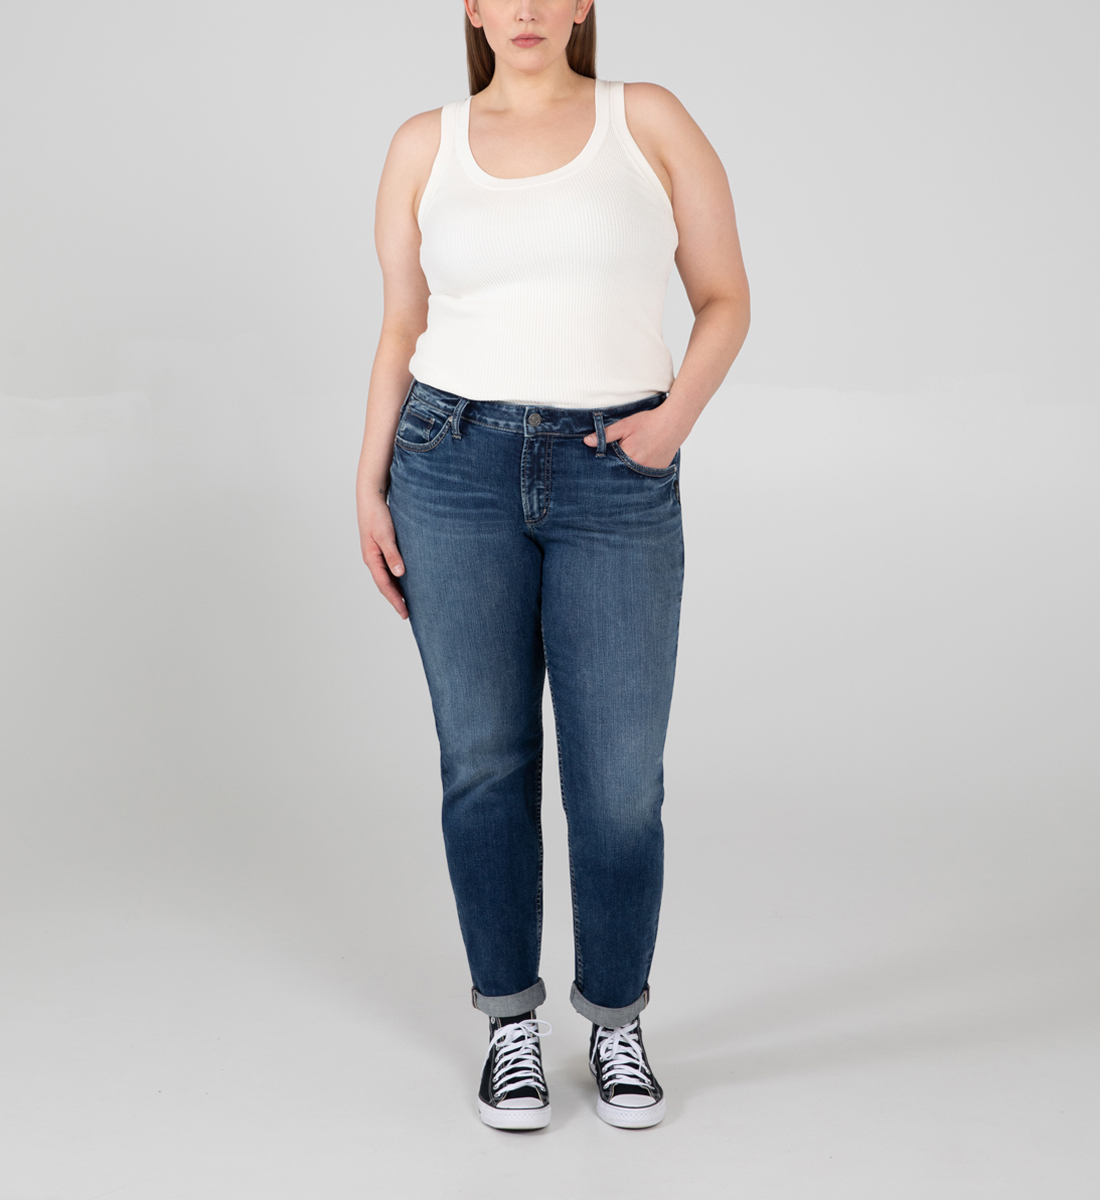 Silver Jeans Boyfriend Mid Rise Slim Leg Jeans Plus Size